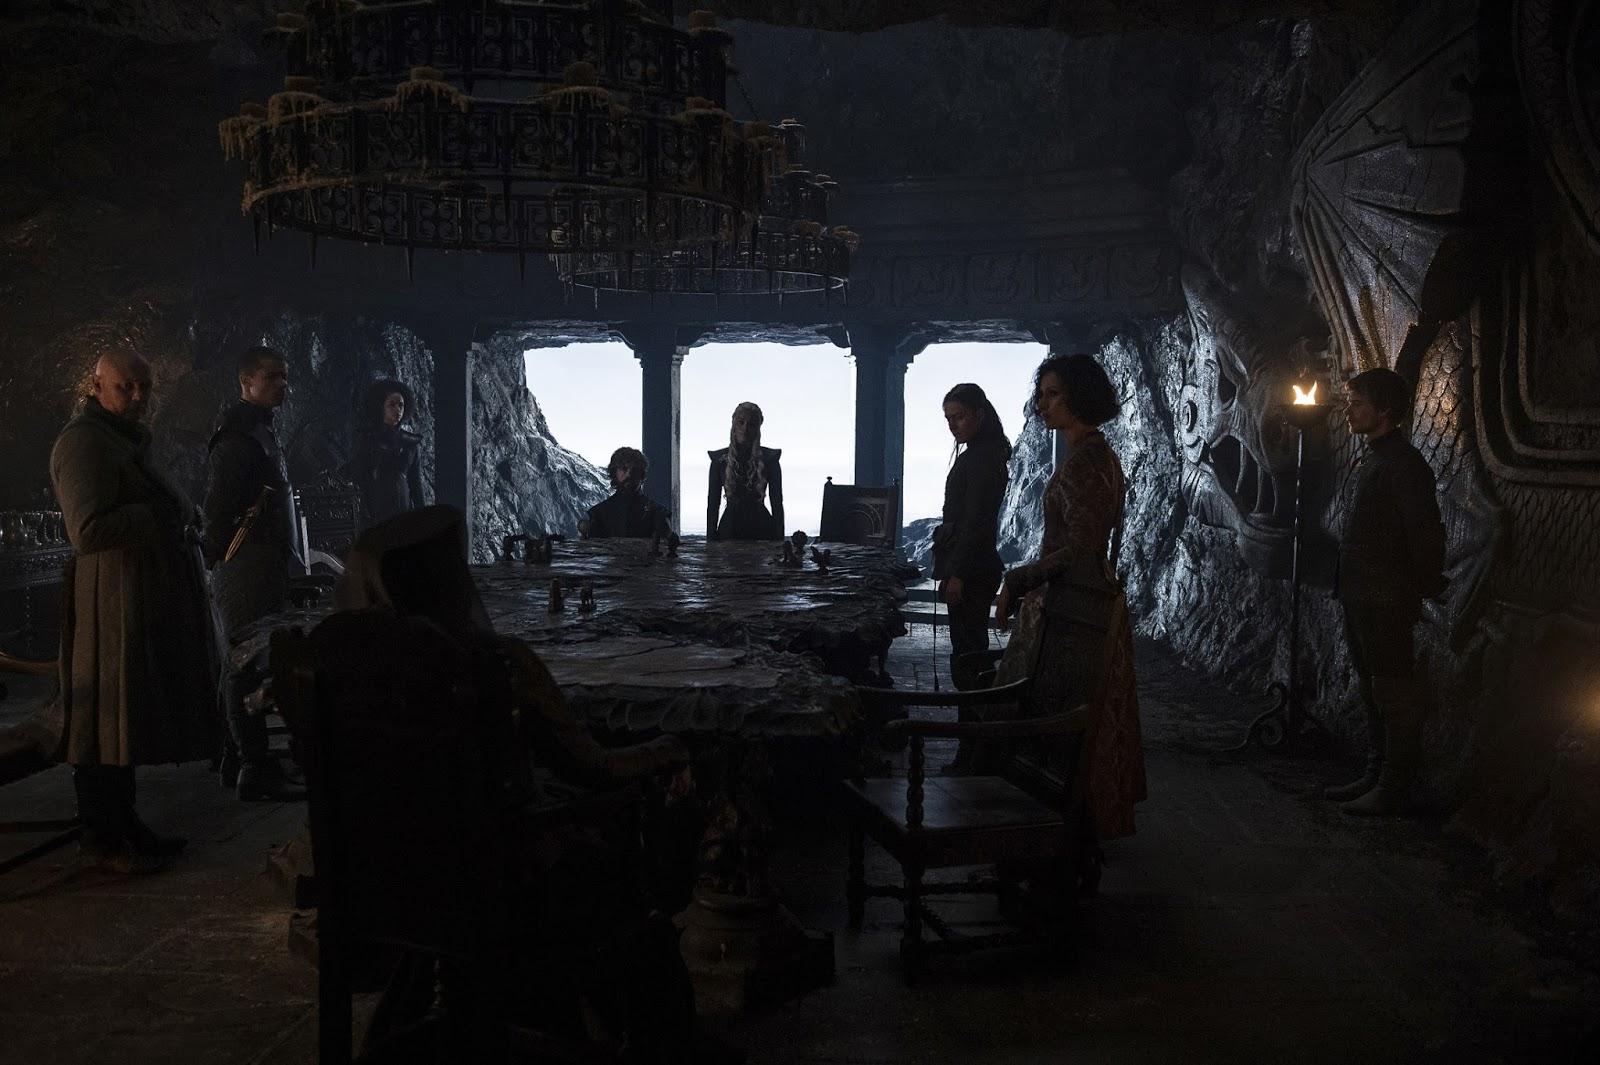 Game of Thrones Season 7 Episode #2